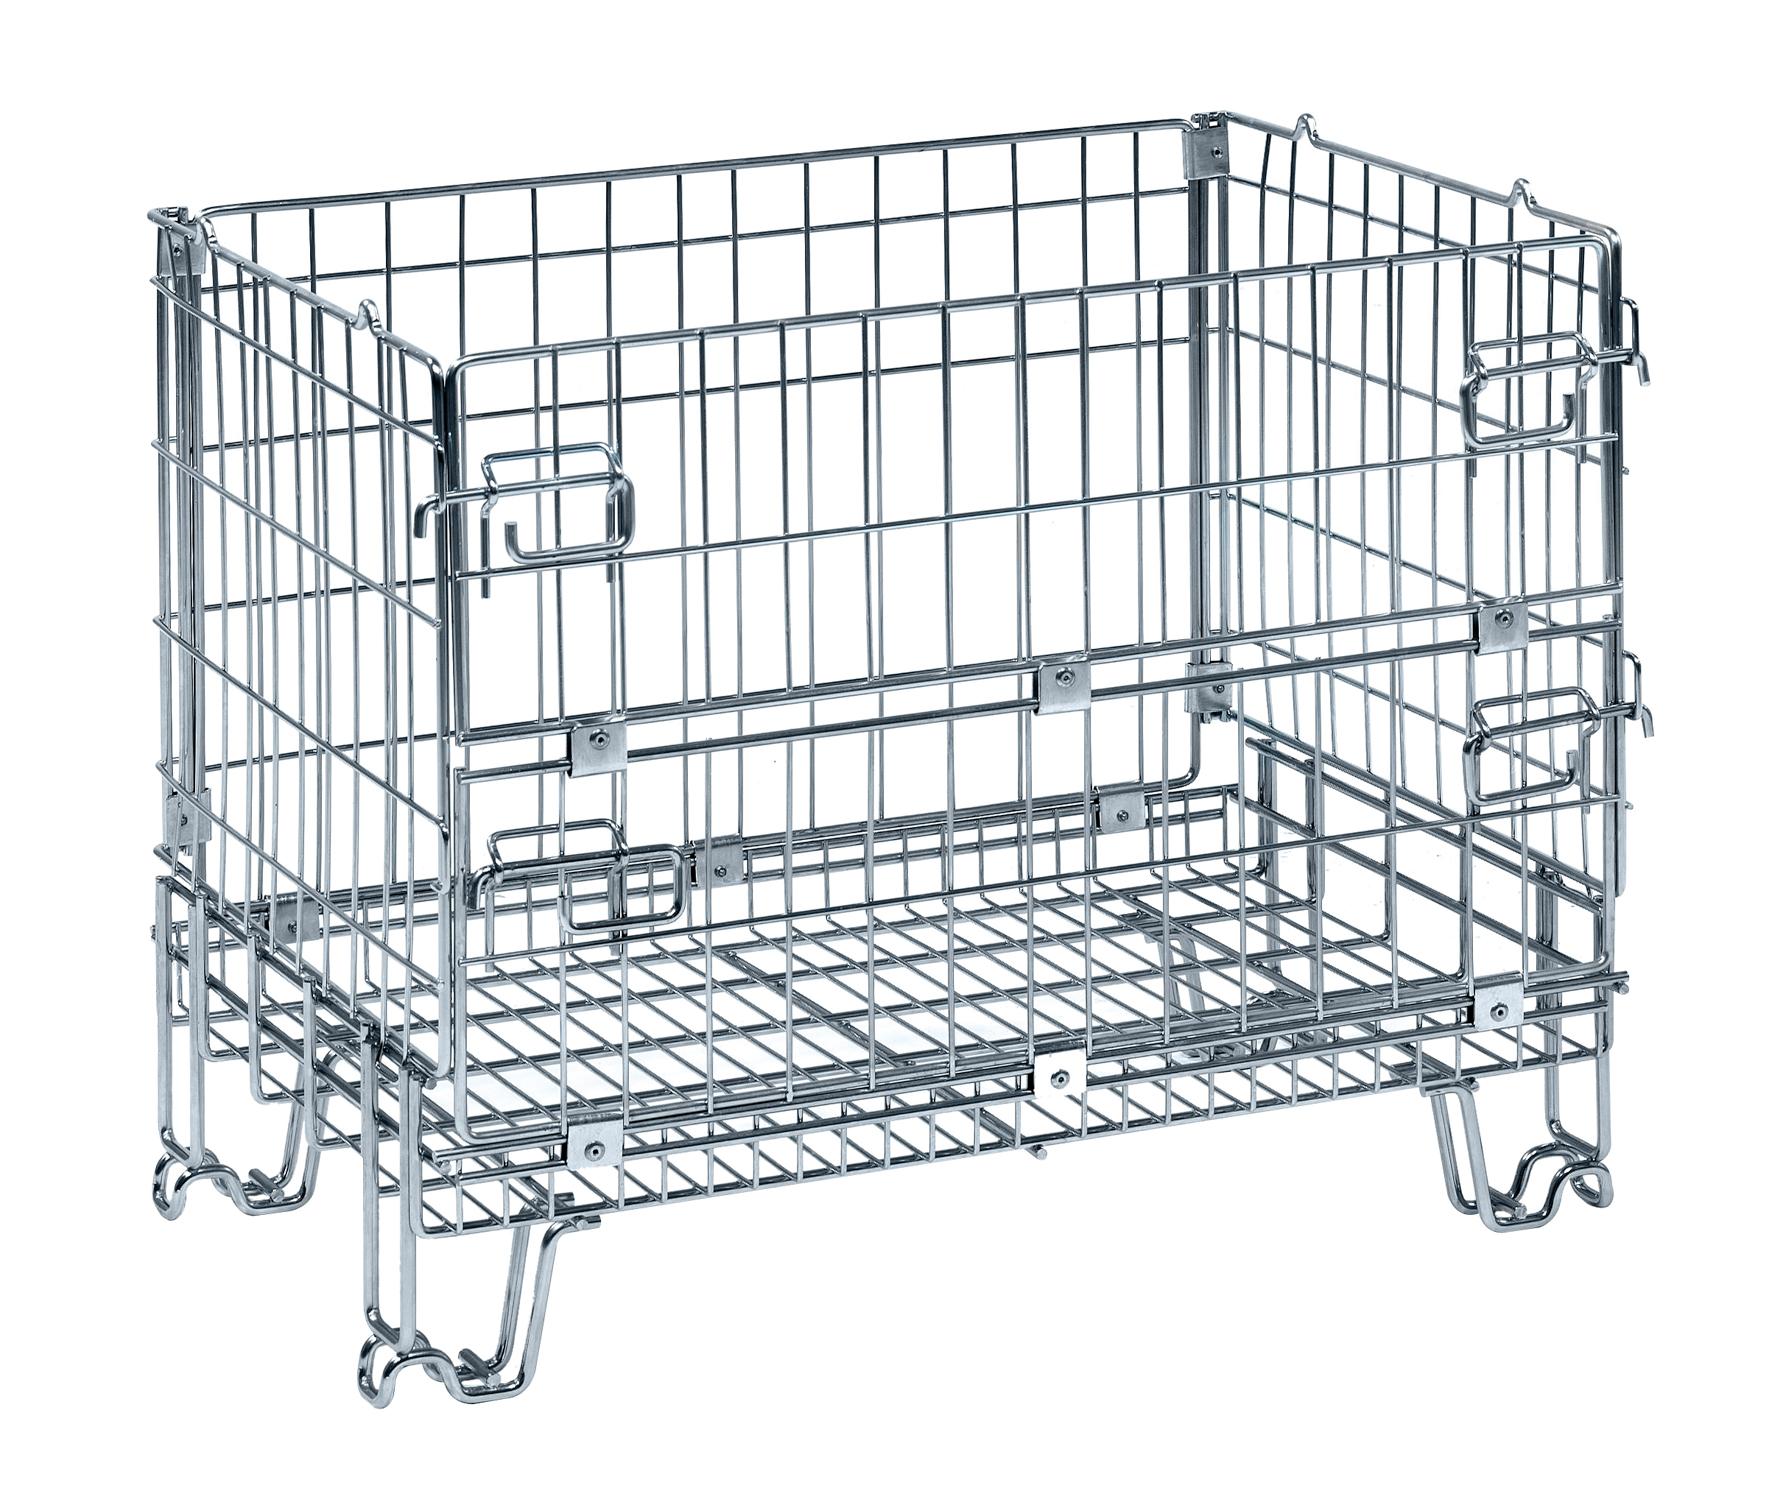 KM0550085 | Mesh Basket